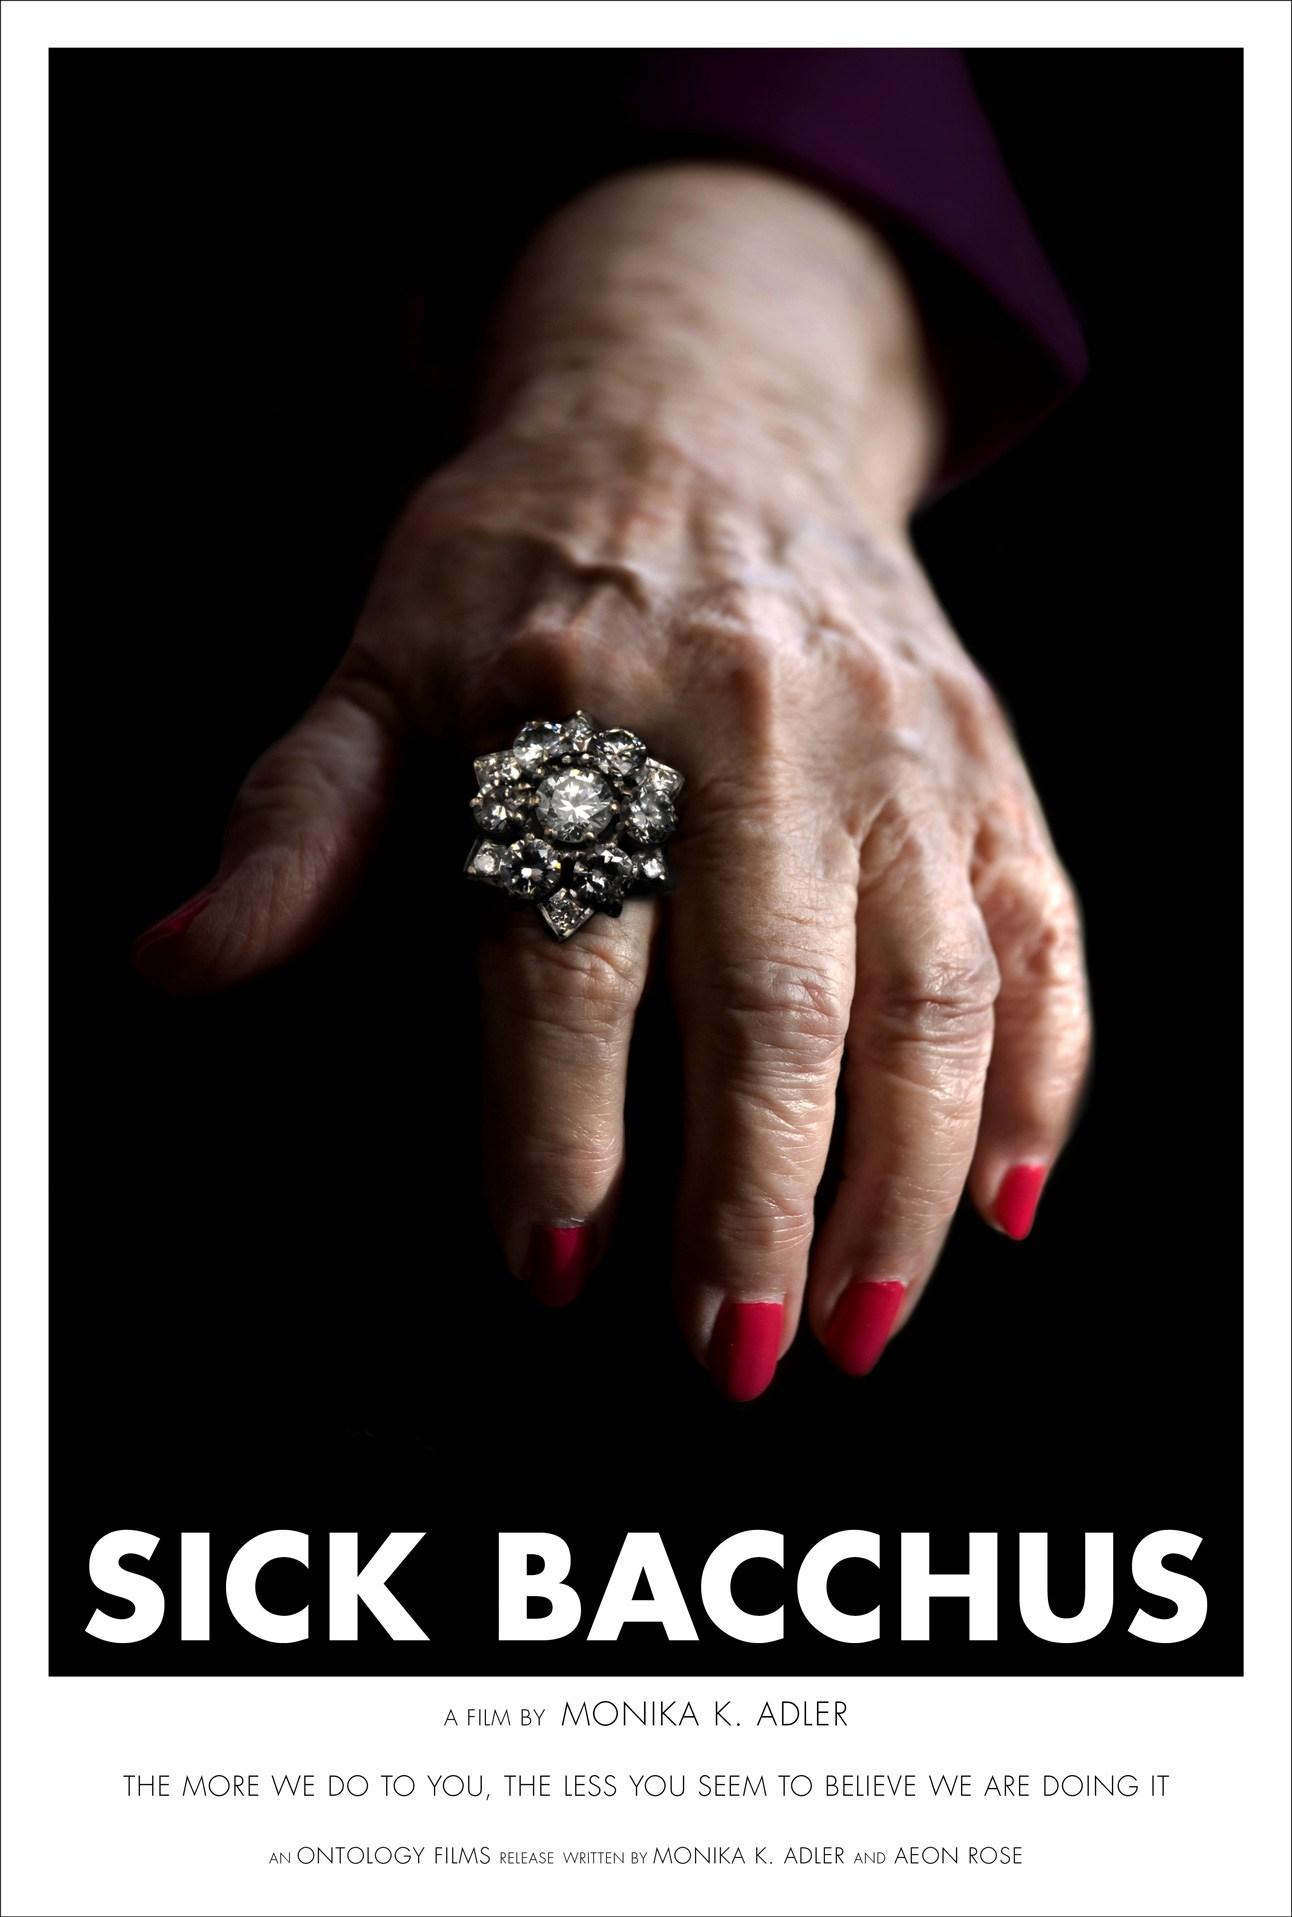 Feature Film Sick Bacchus Movie Poster, concept poster, Directed By: Monika K. Adler, Ontology Films, Screenplay, Monika K. Adler, Aeon Rose